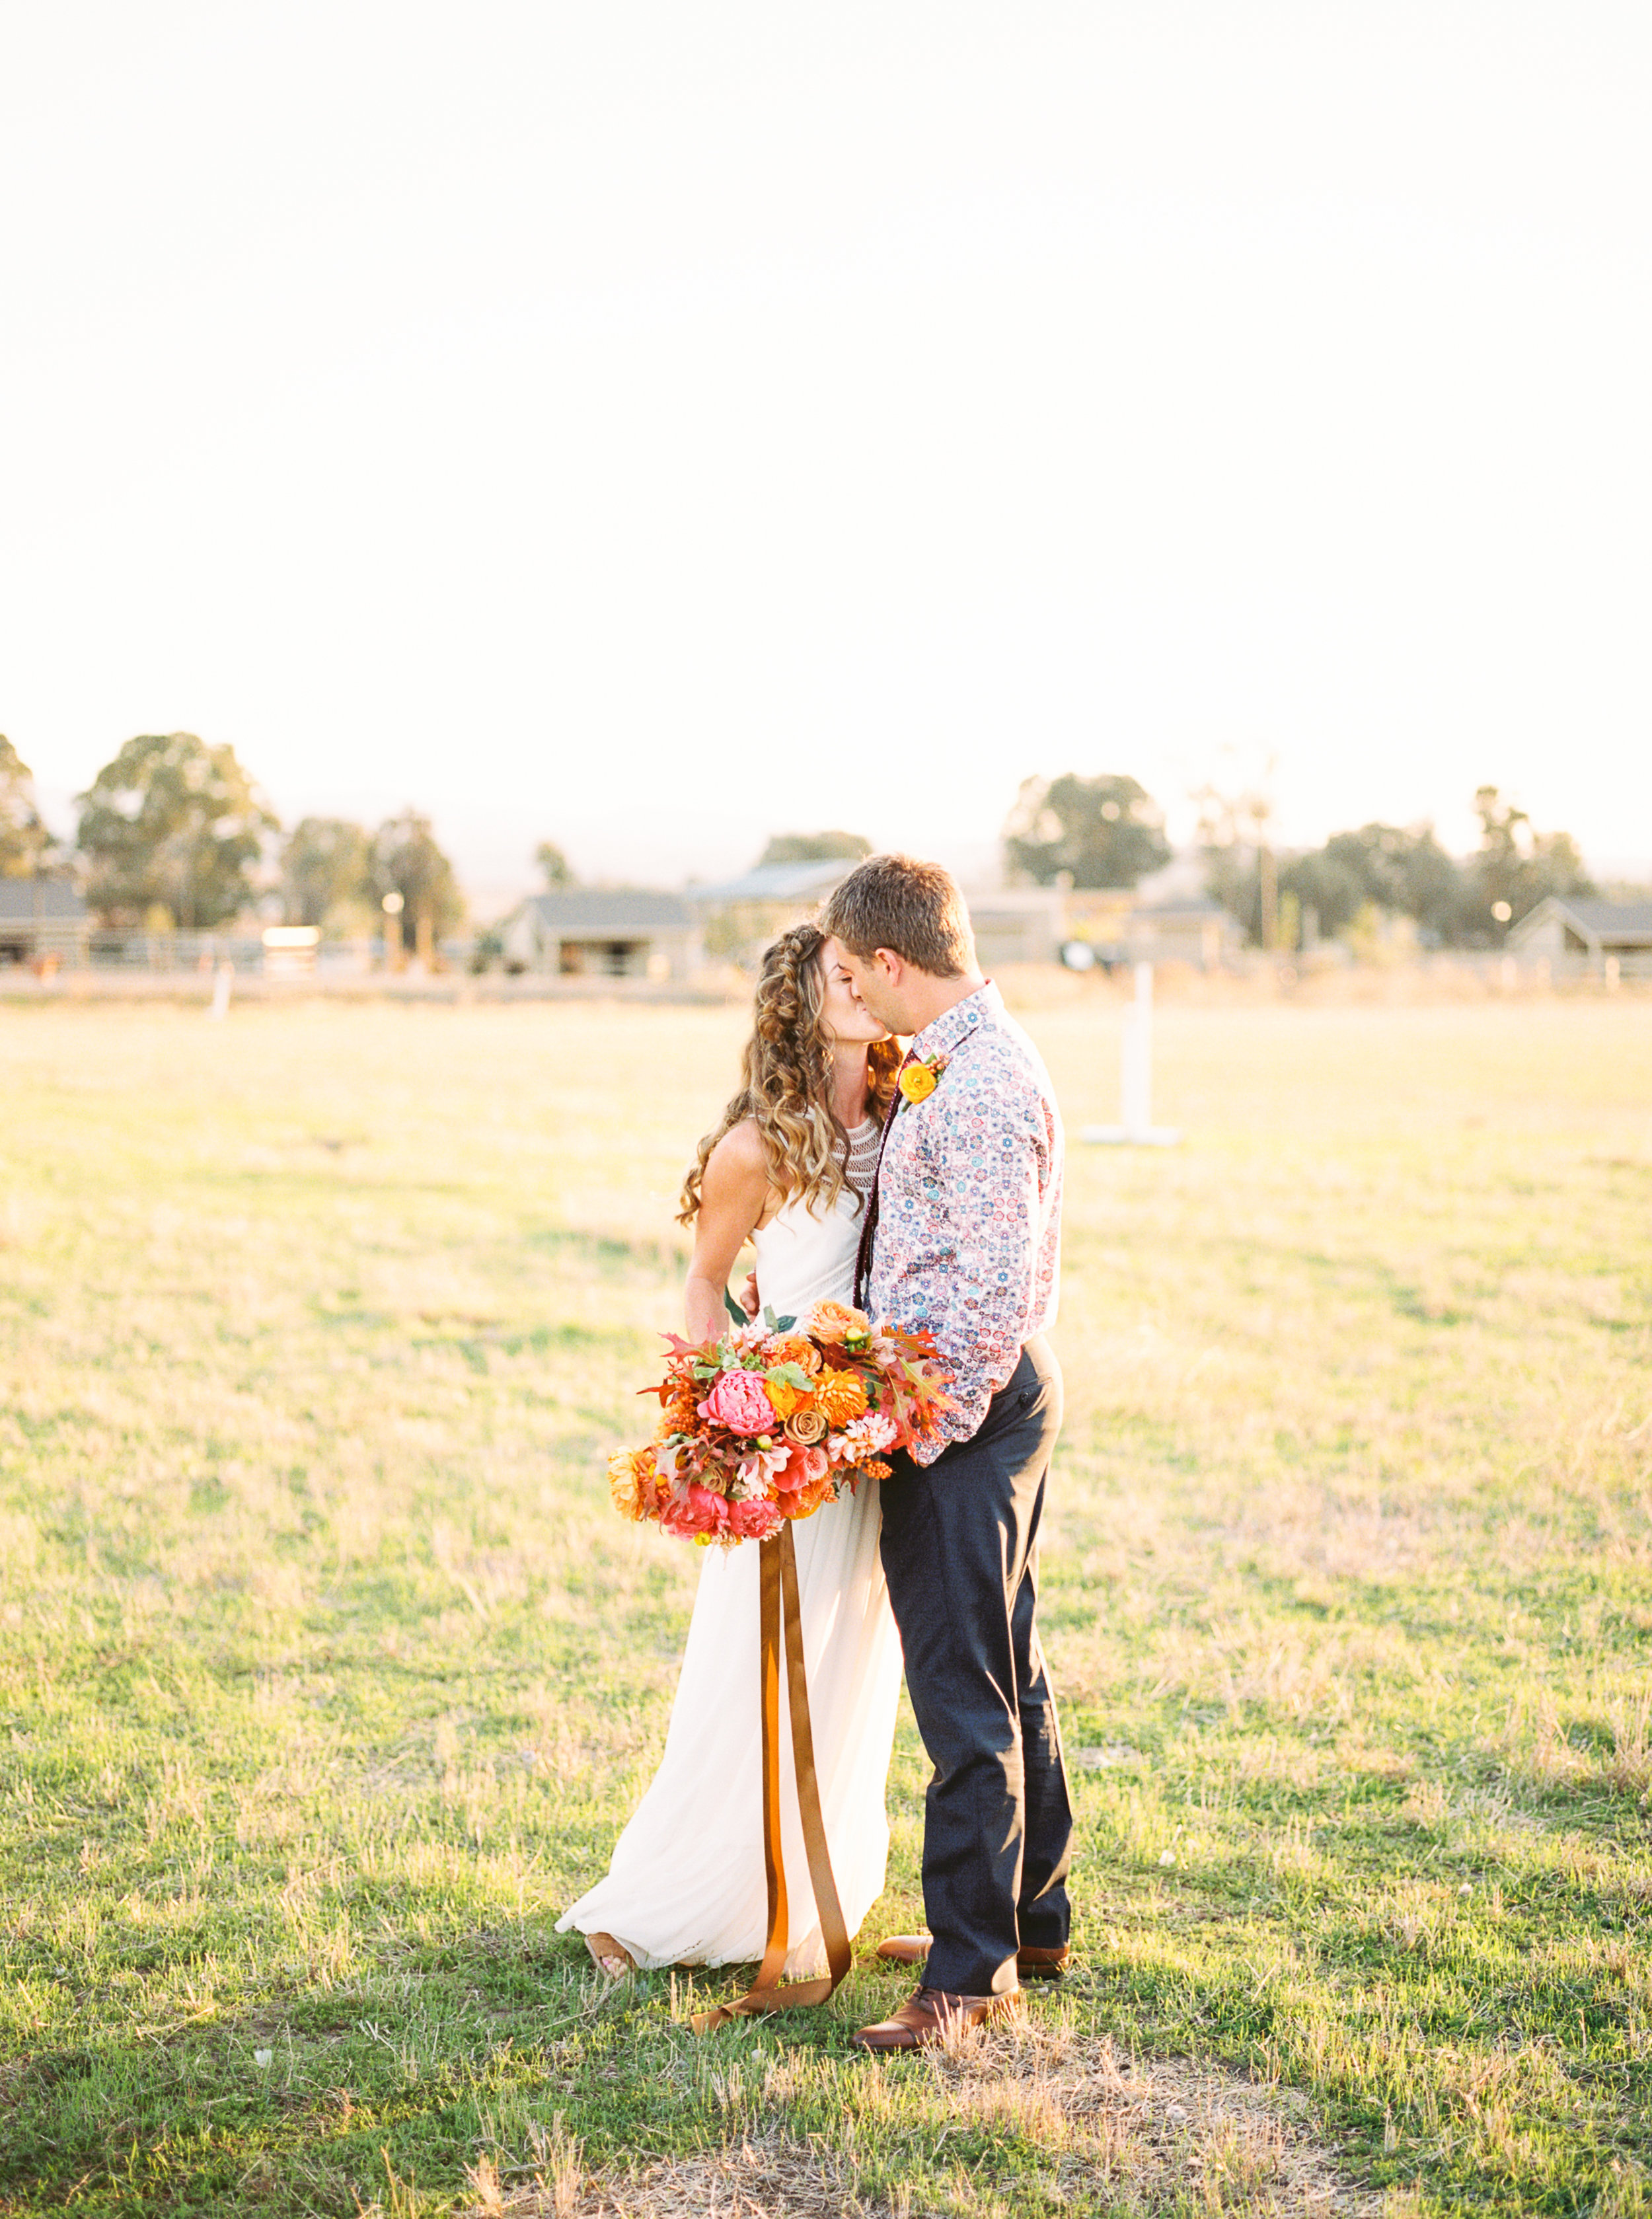 skylar-rain-photography-colorado-springs-wedding-dp.jpg